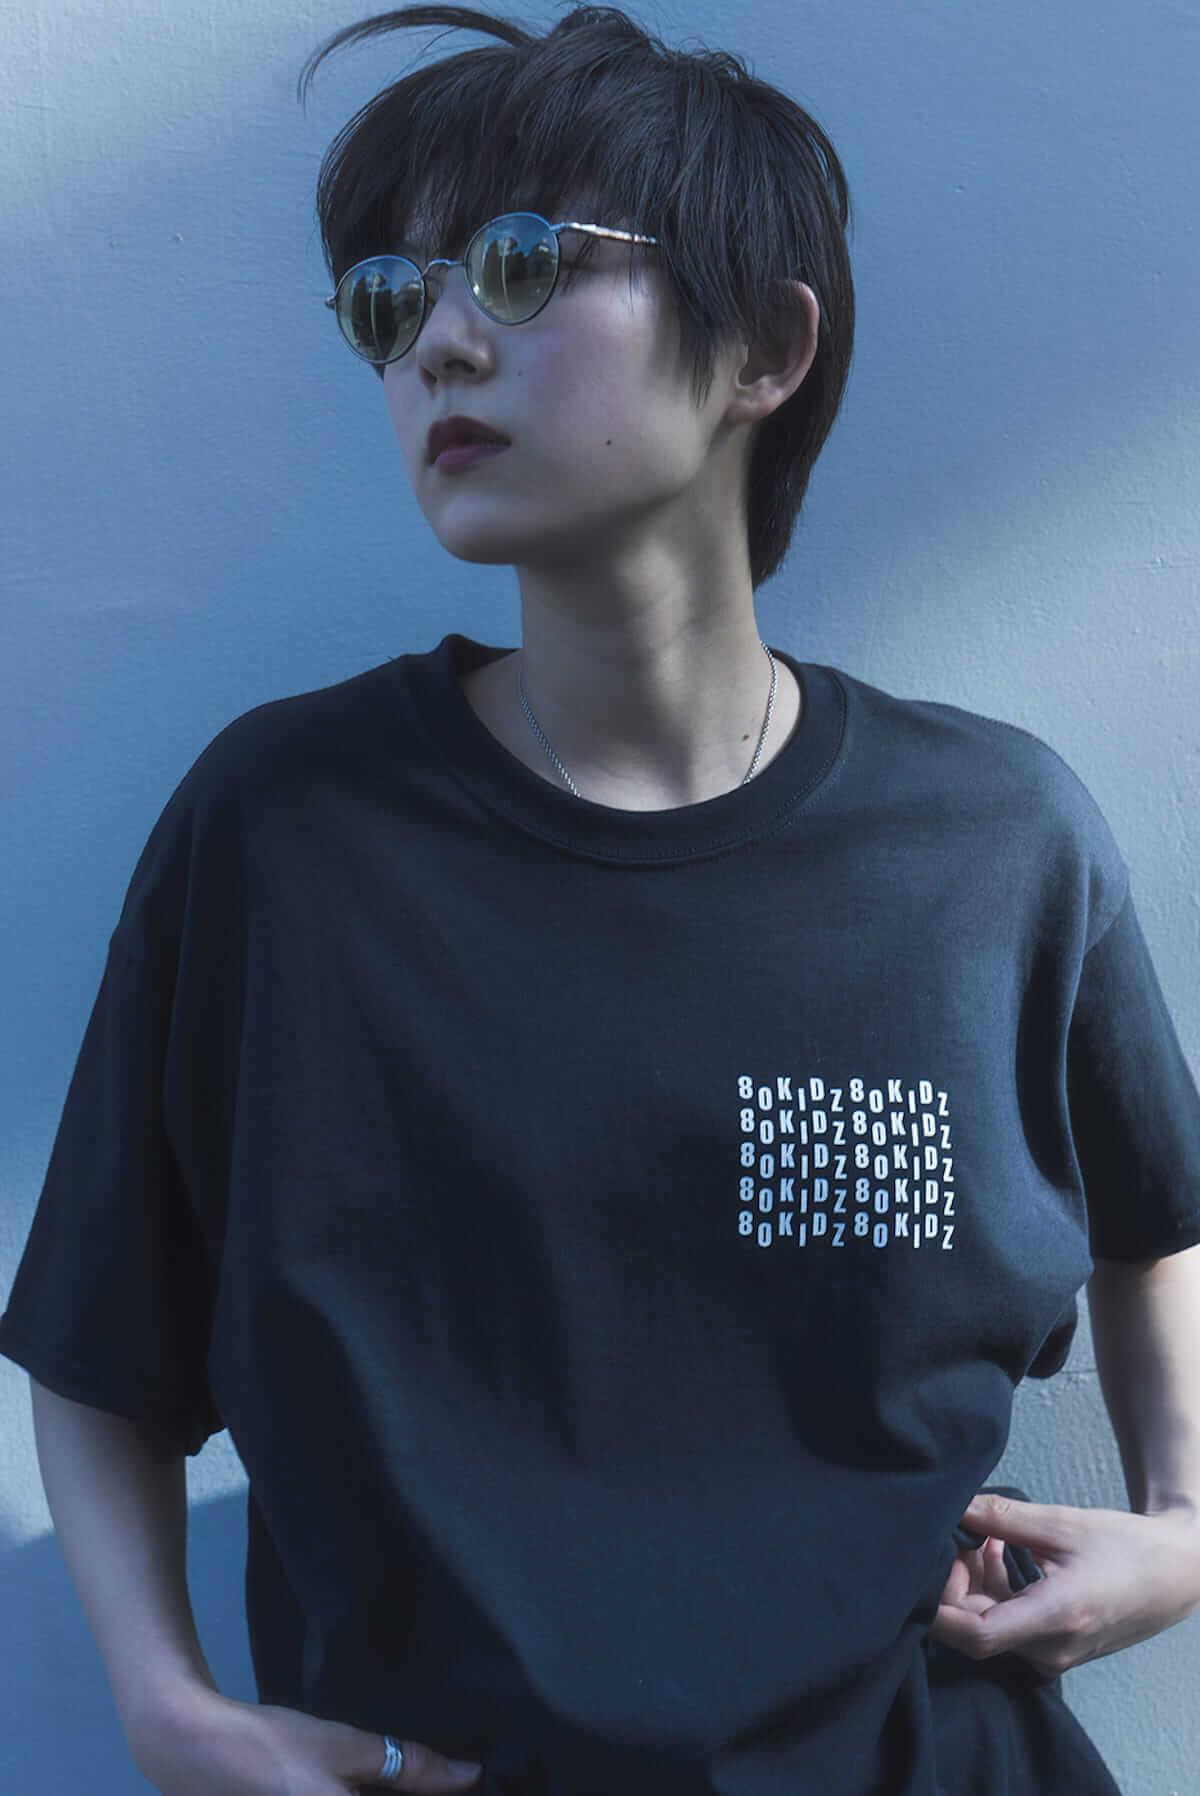 80KIDZのデビュー10周年WEB SHOPがオープン ベスト盤やリミックス集、YOSHIROTTENとのコラボTシャツのプレオーダー開始 music180804-80kidz10thanniv-4-1200x1796